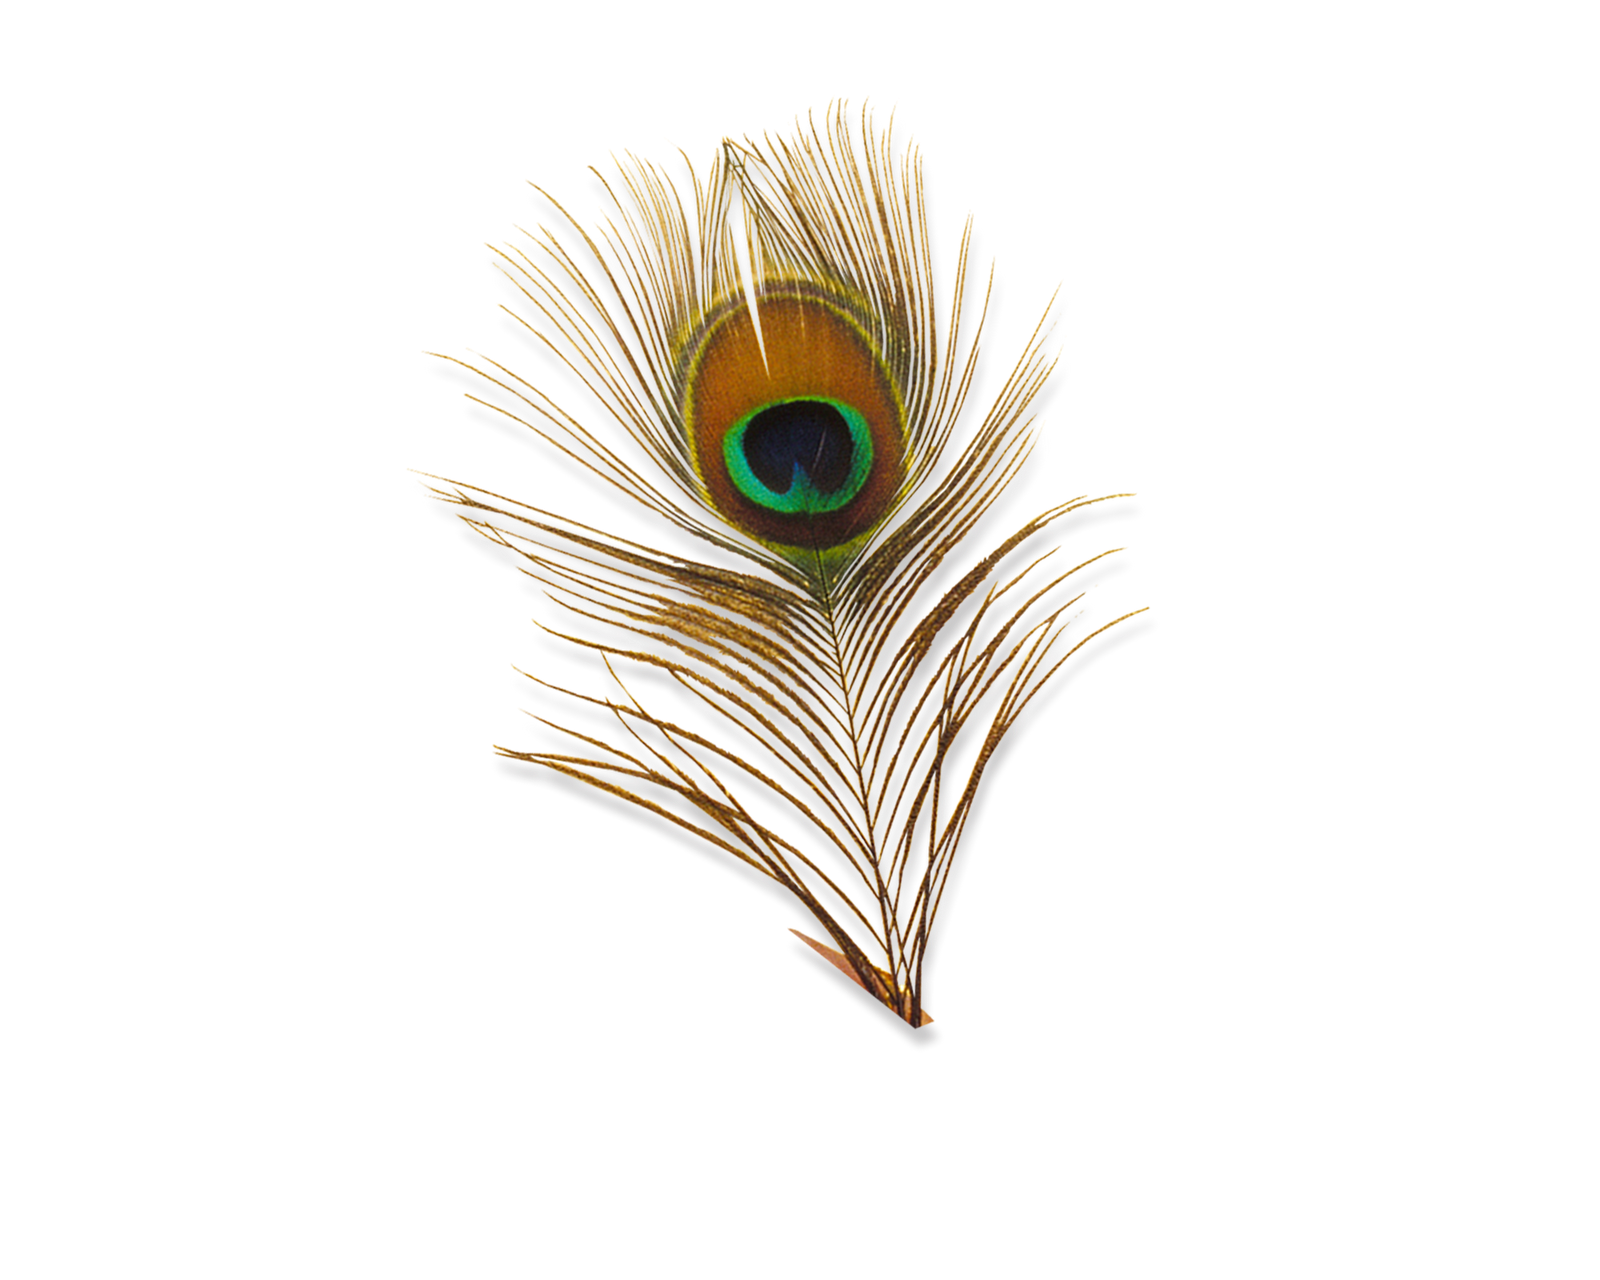 Beautiful peacock feathers eye : My Blog